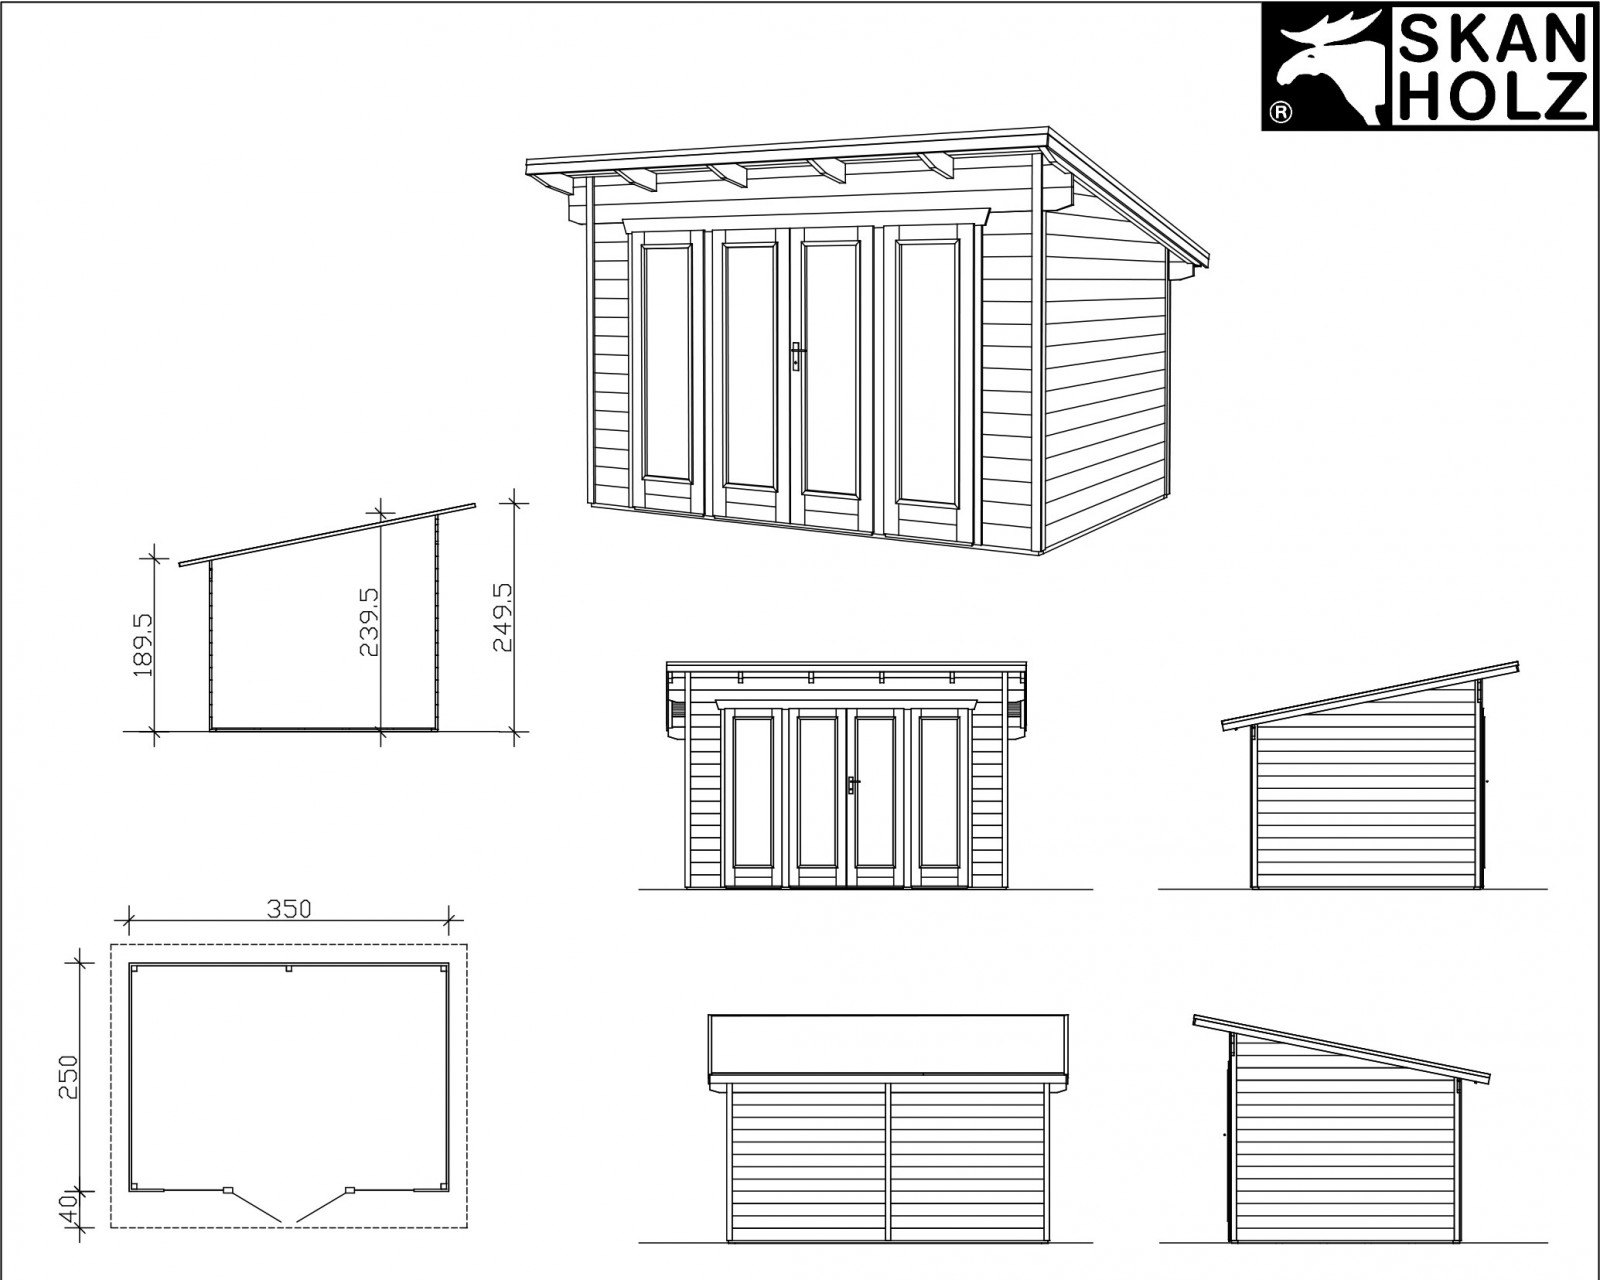 lomamaja skan holz ostende 1 vahvuus 28 mm 350x250 cm 8 75 m. Black Bedroom Furniture Sets. Home Design Ideas